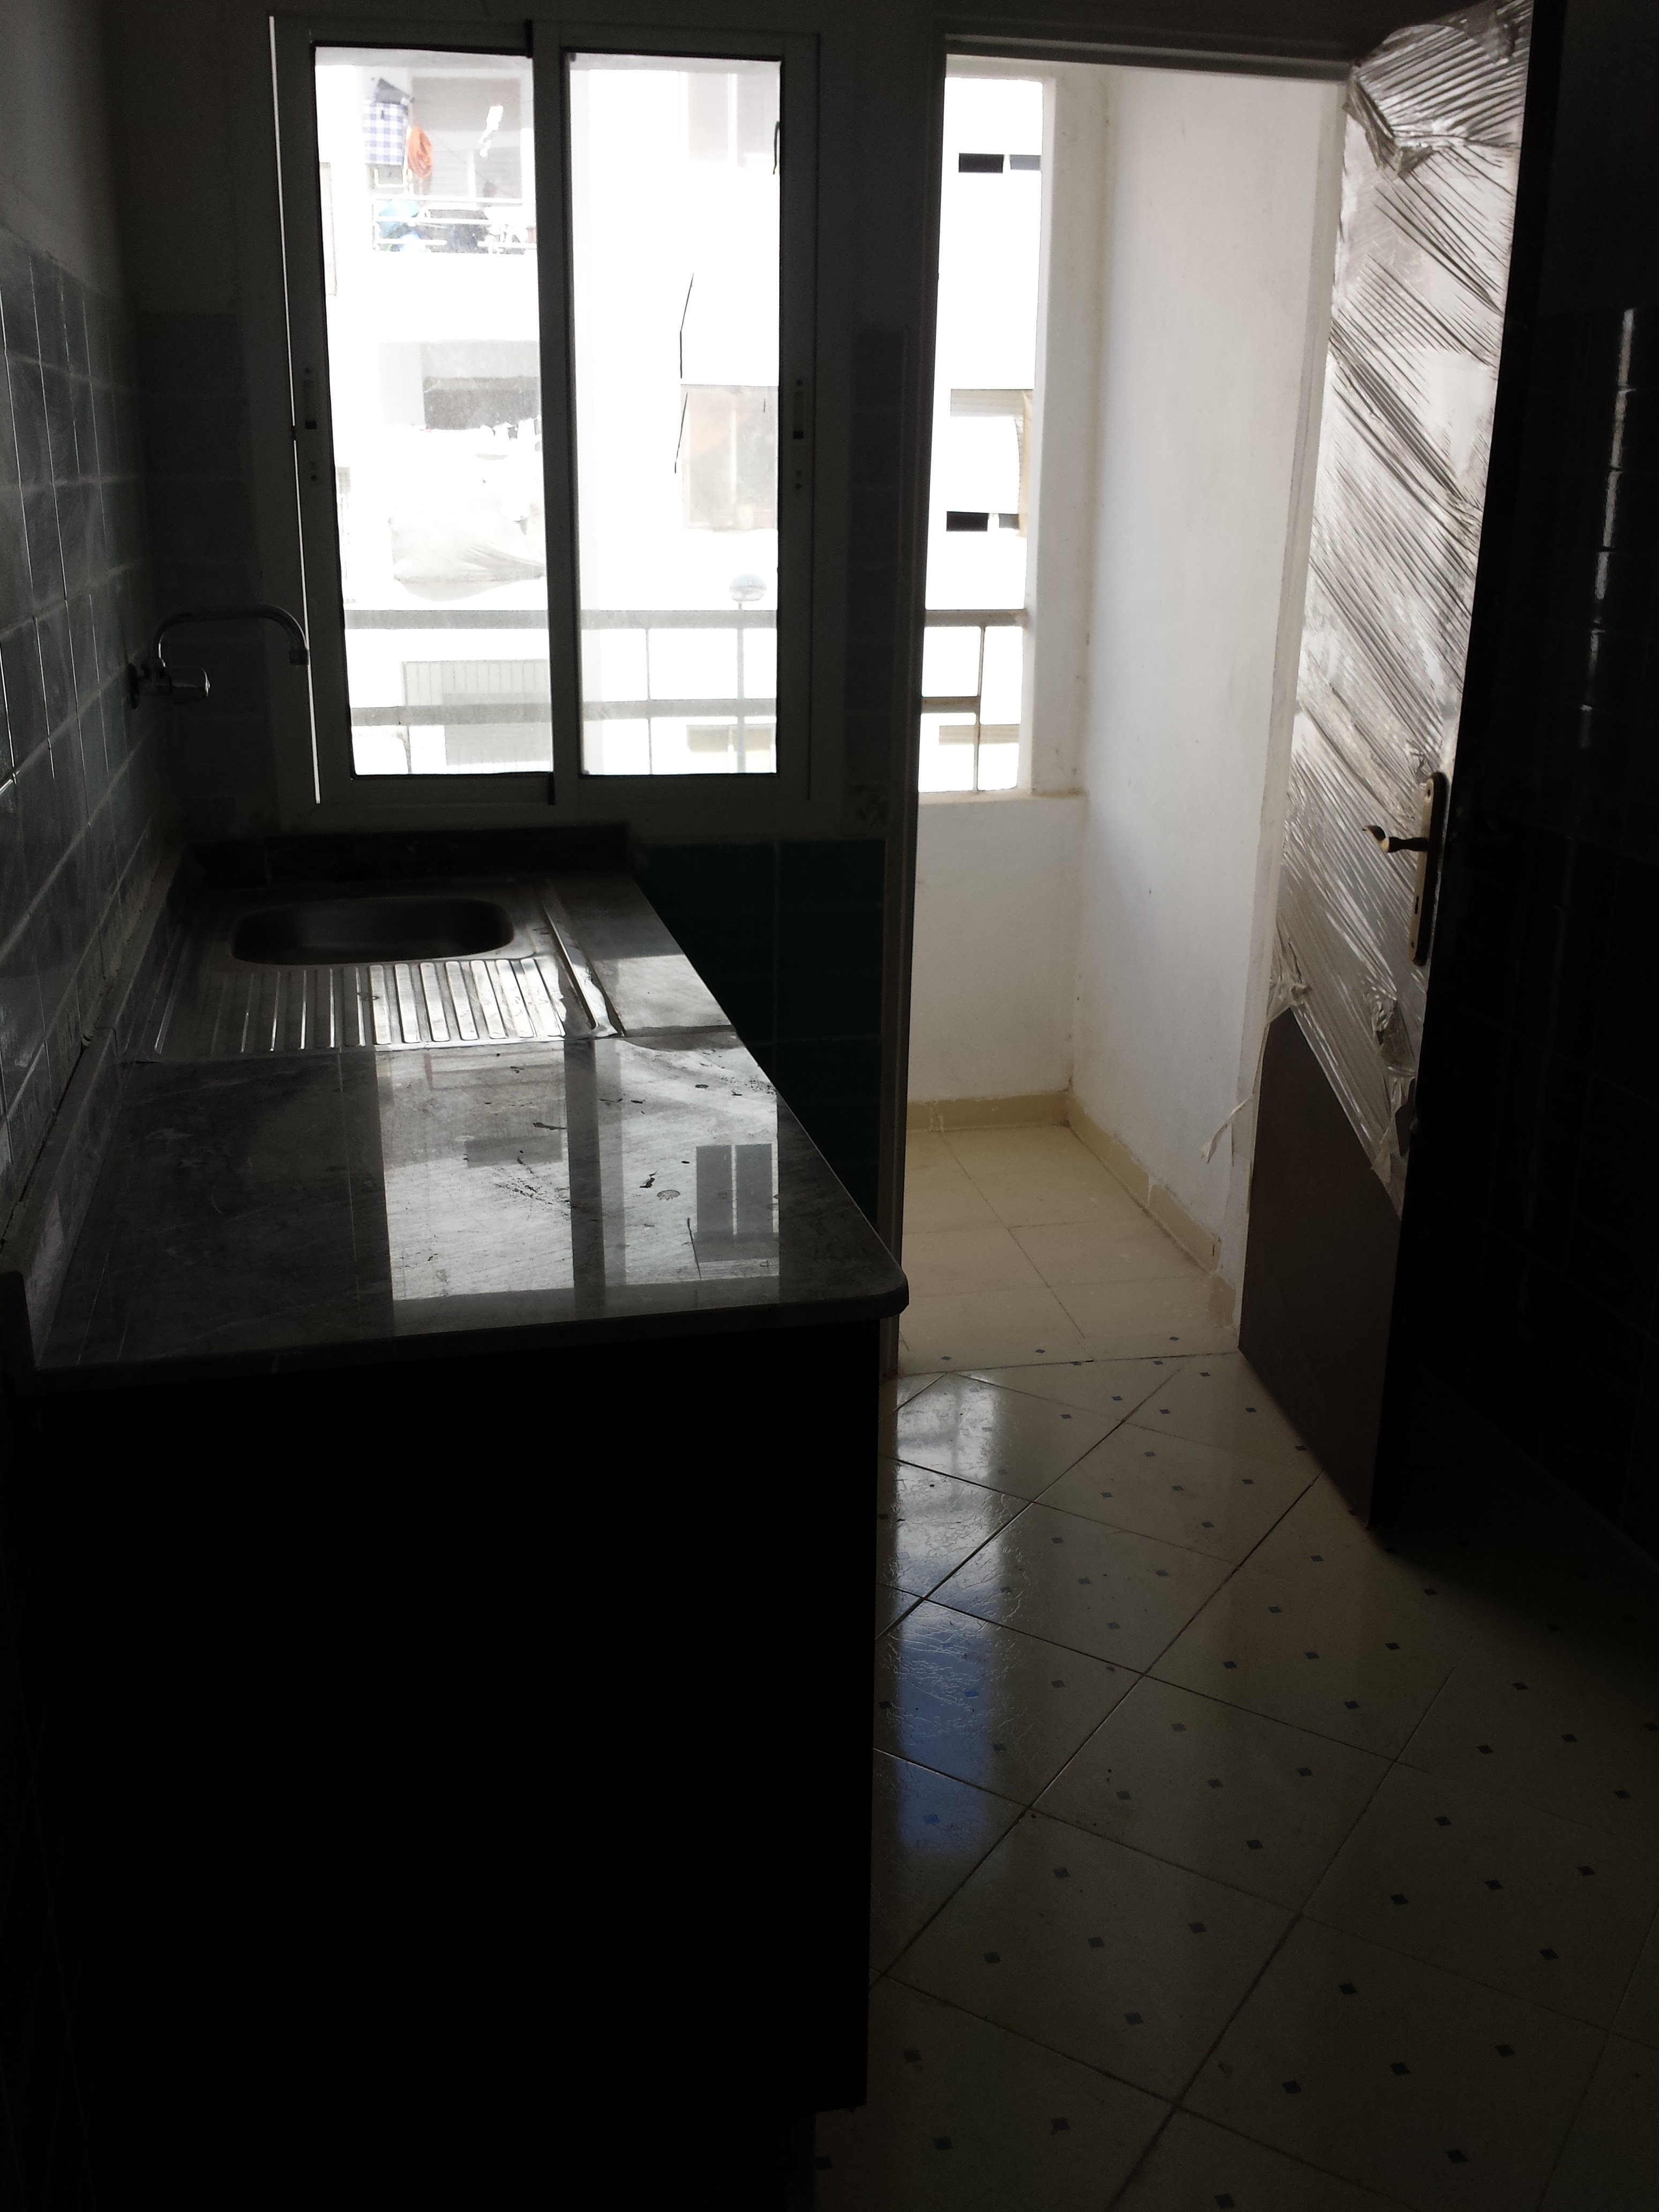 Verkoop 3 slaapkamers tanger tangeri marokko doha m - Slaapkamer marokko ...